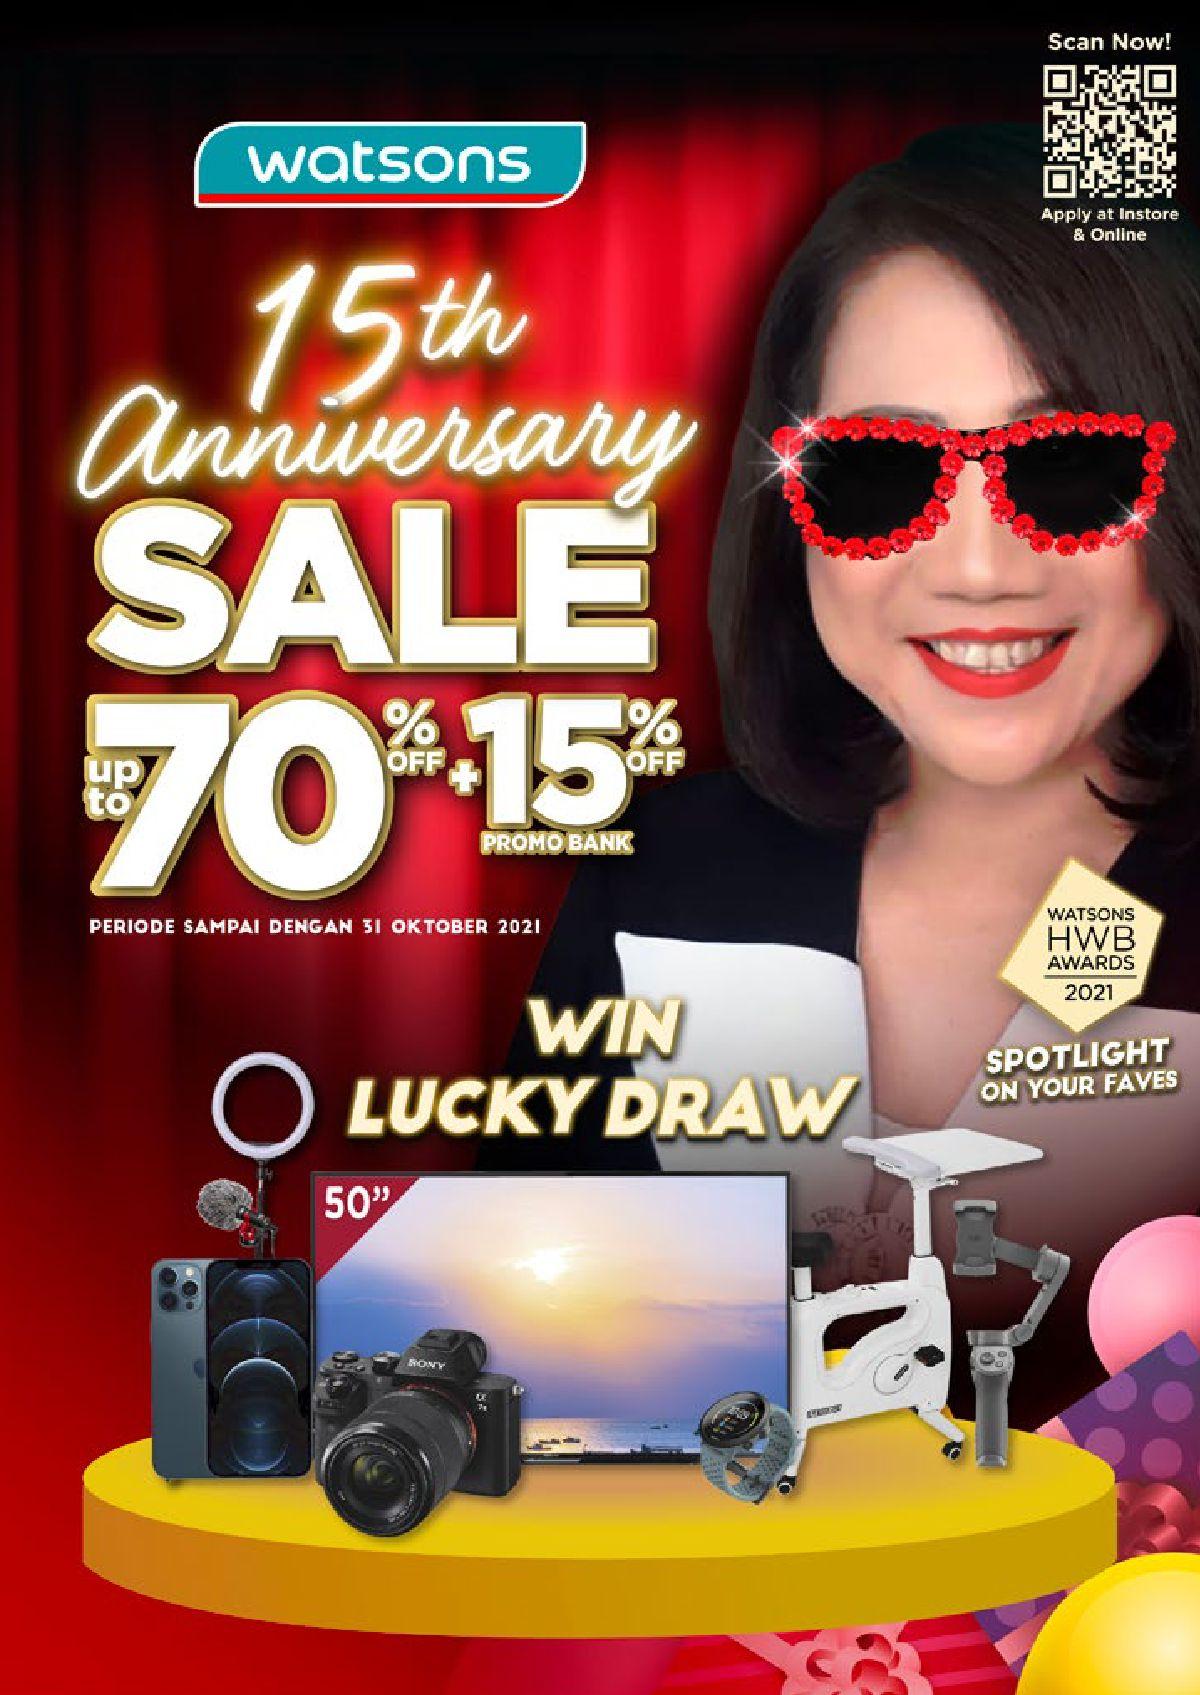 Katalog Belanja Watsons Terbaru - Watsons 15th Annivesary Sale   Discount Up to 70% + 15% on your favorite products